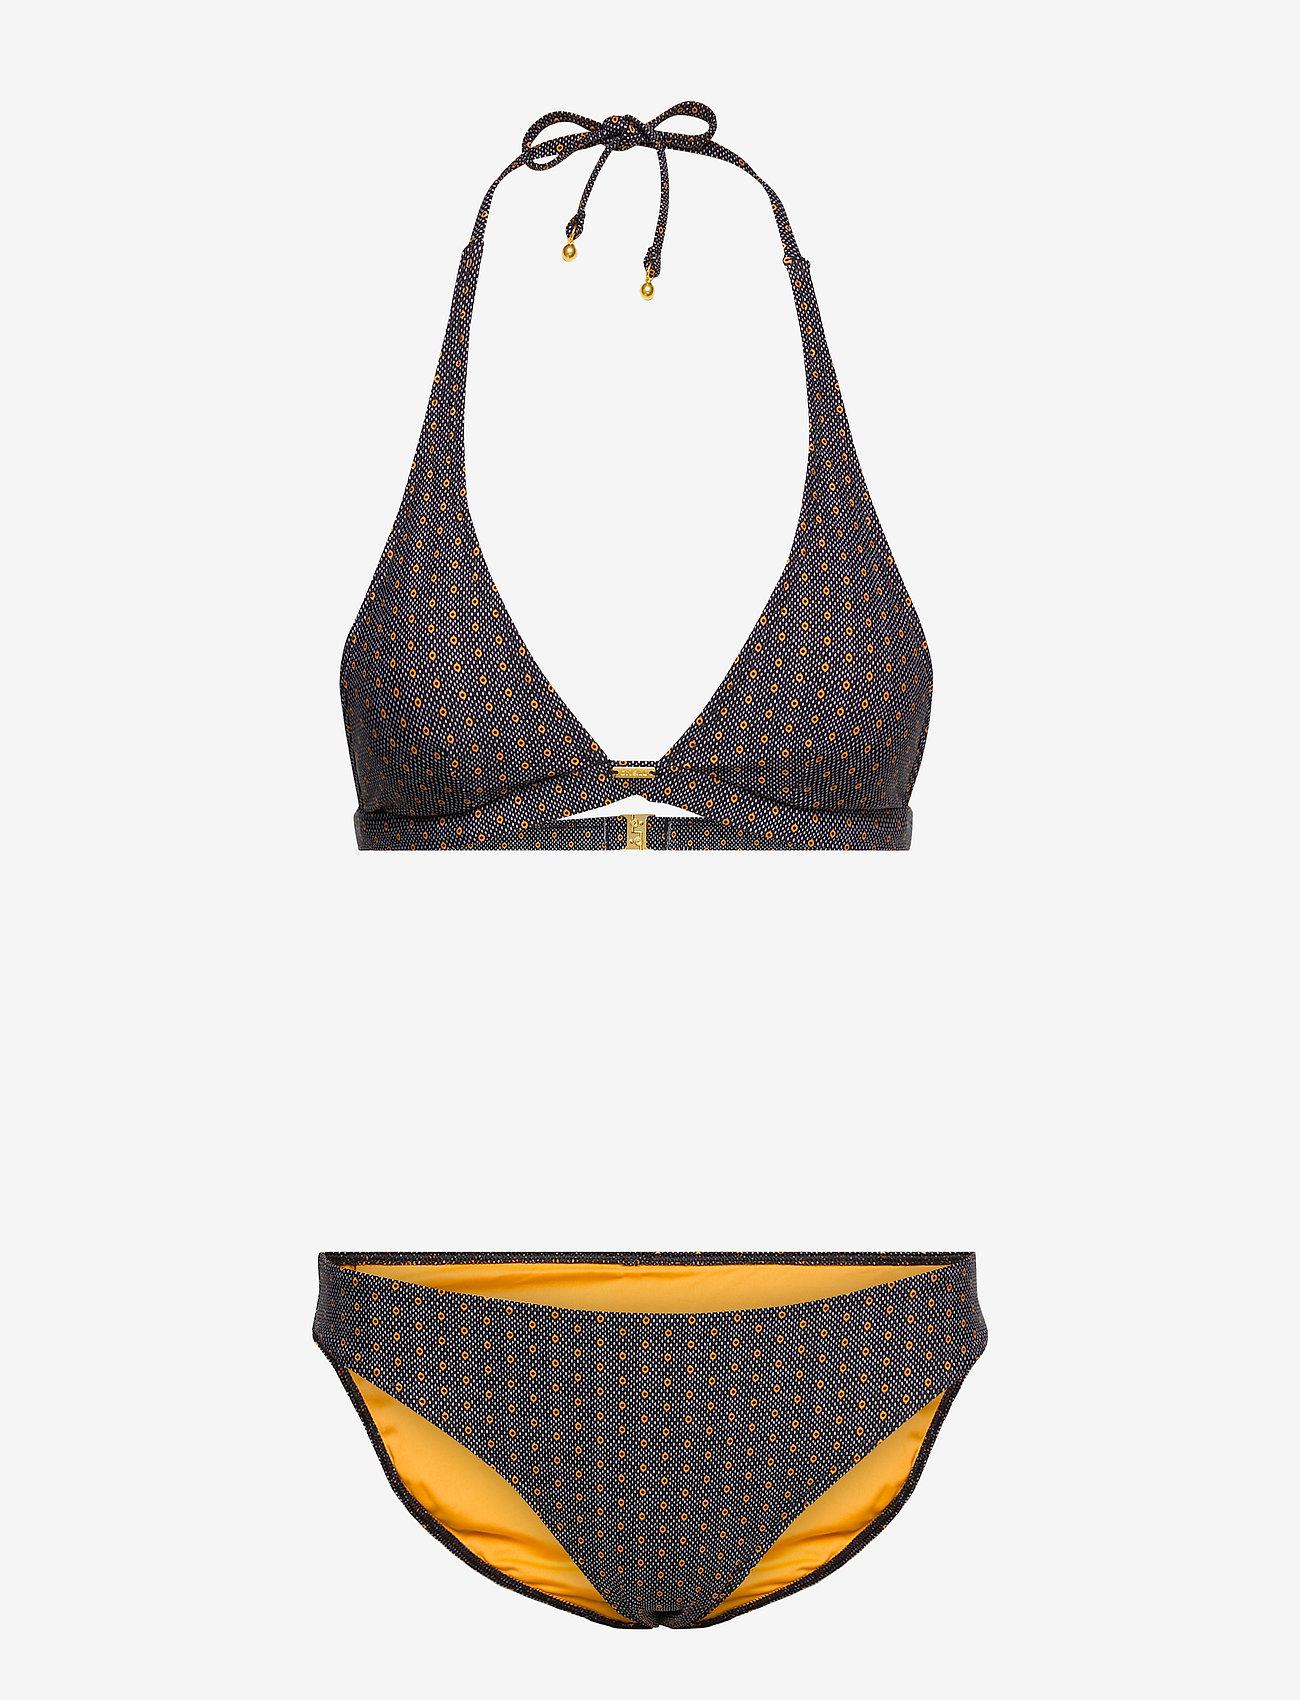 O'neill - PW MARGA  RITA FIXED SET - MM - bikini sæt - black aop w/ yellow - 0